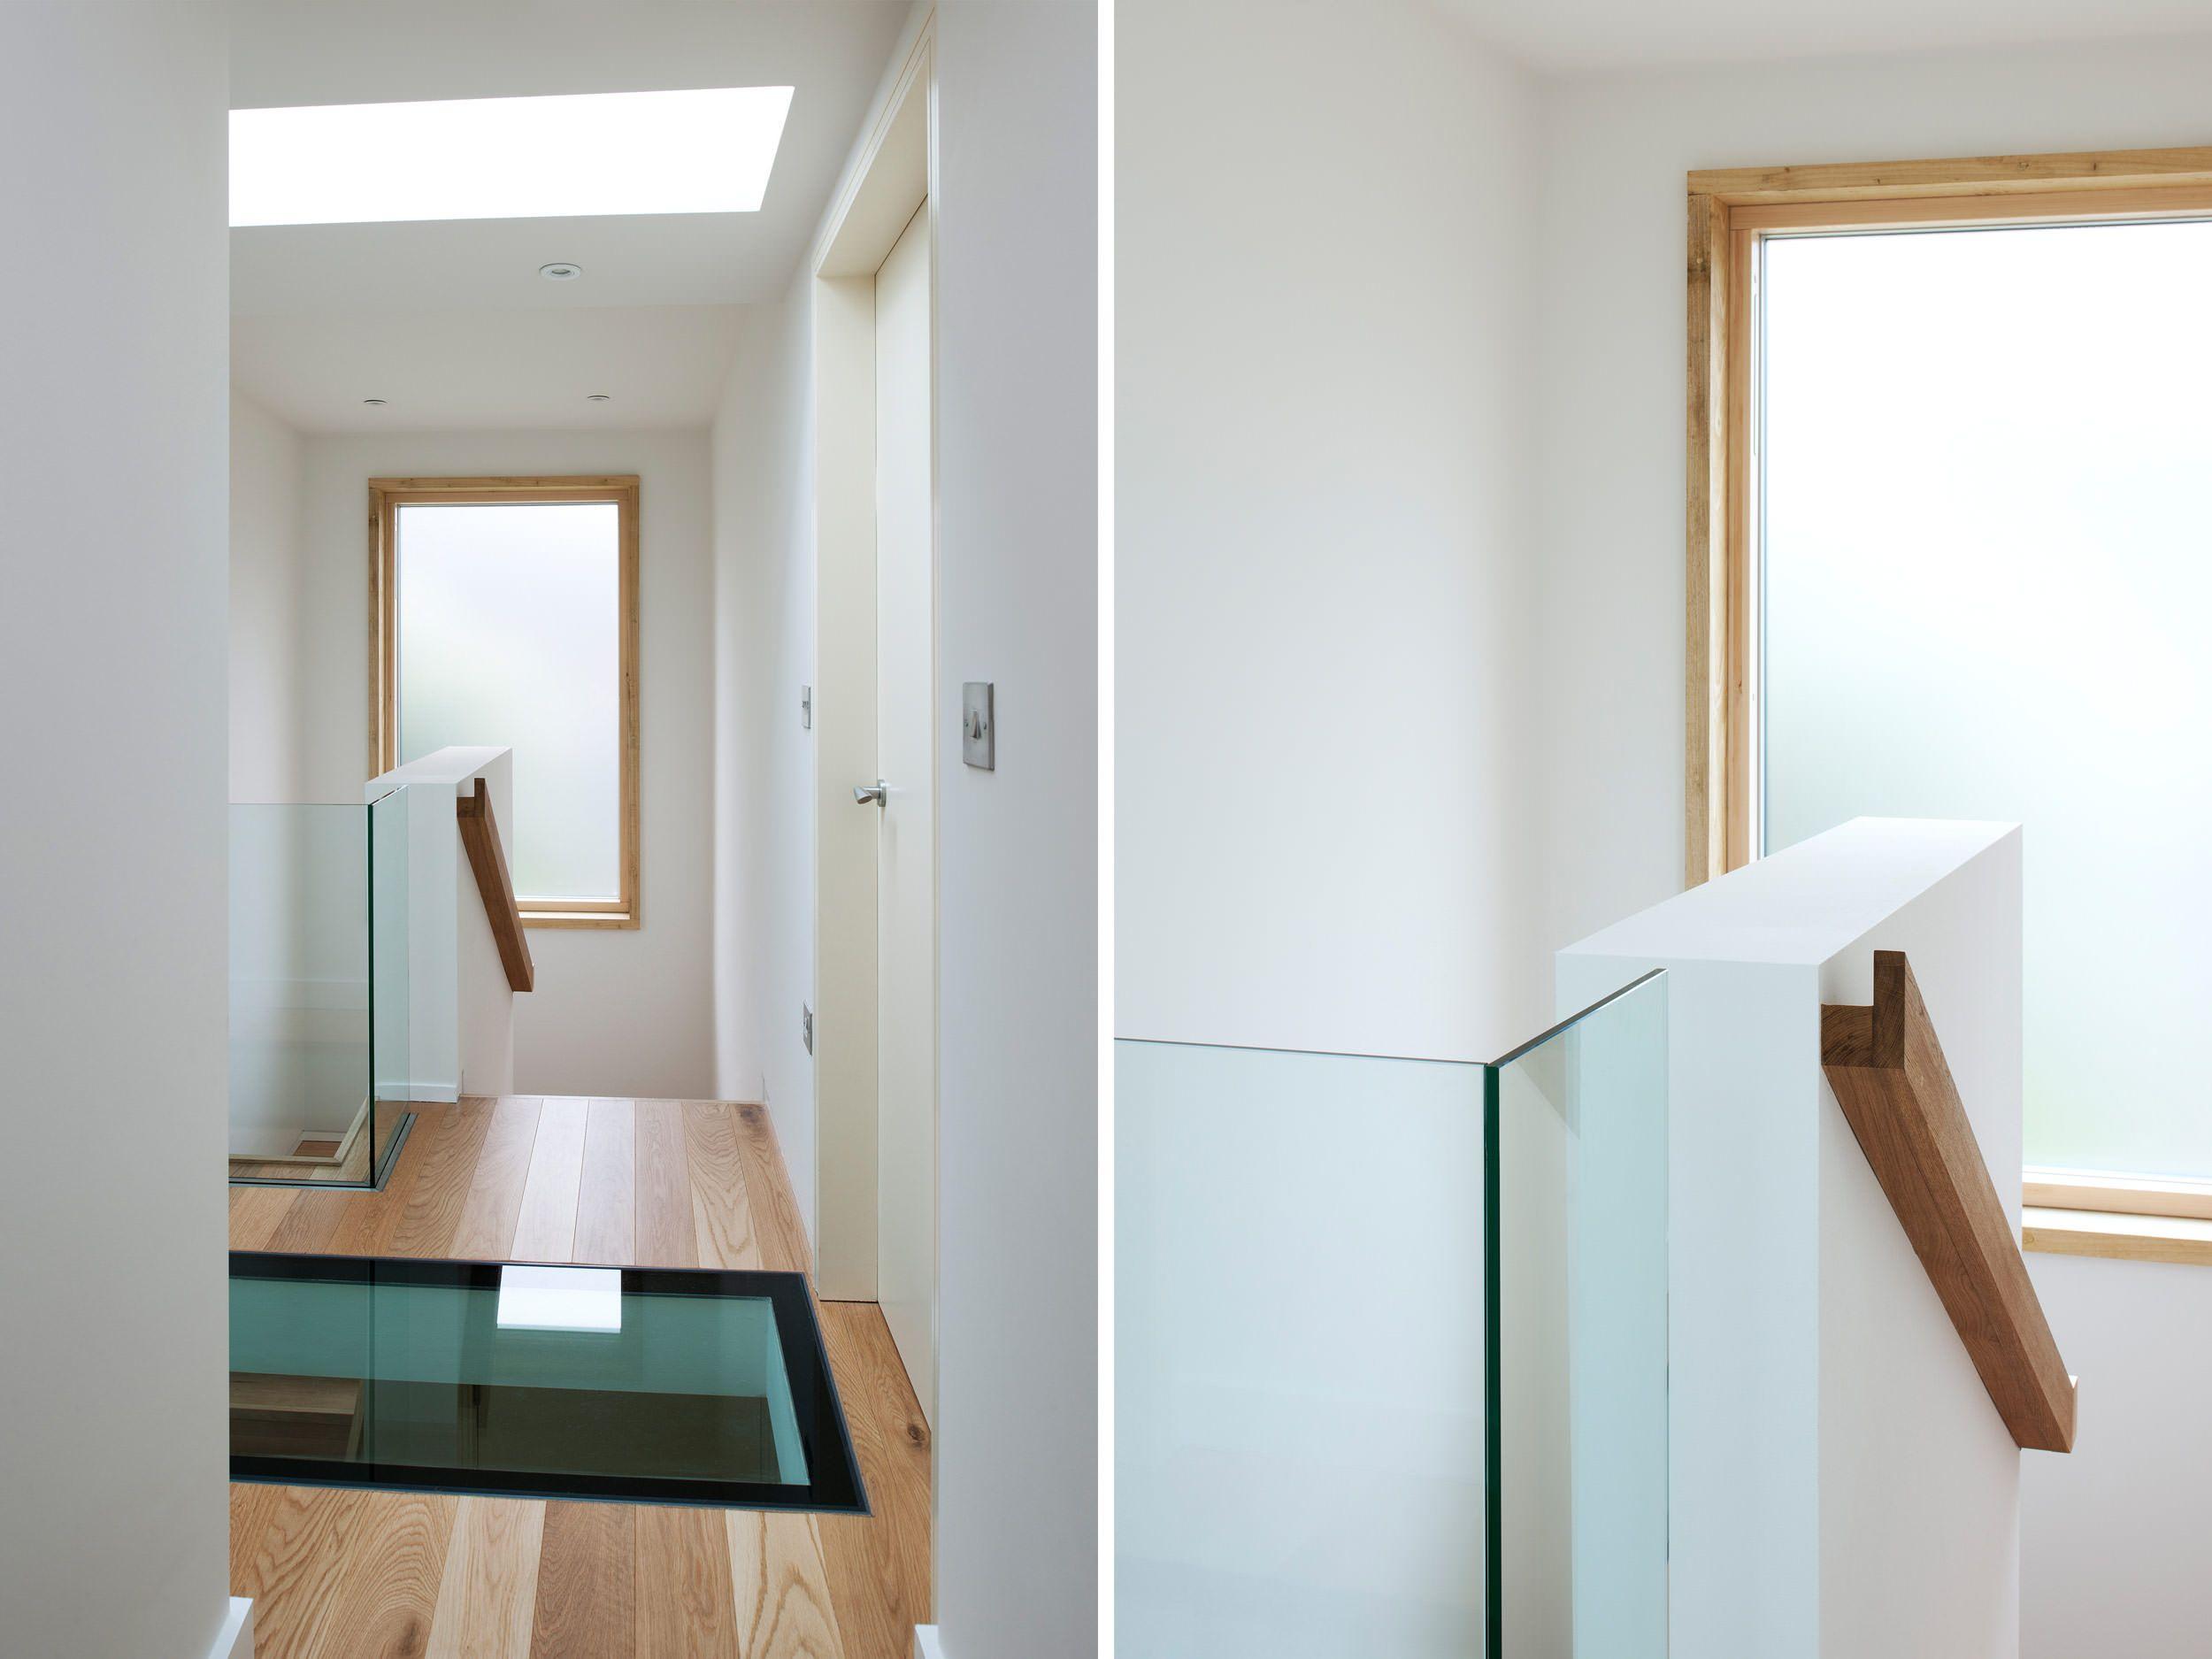 Glass Walkway, Oak Handrail   Extension & Renovation   The Paddocks     PAD Studio Architects   www.PADstudio.co.uk